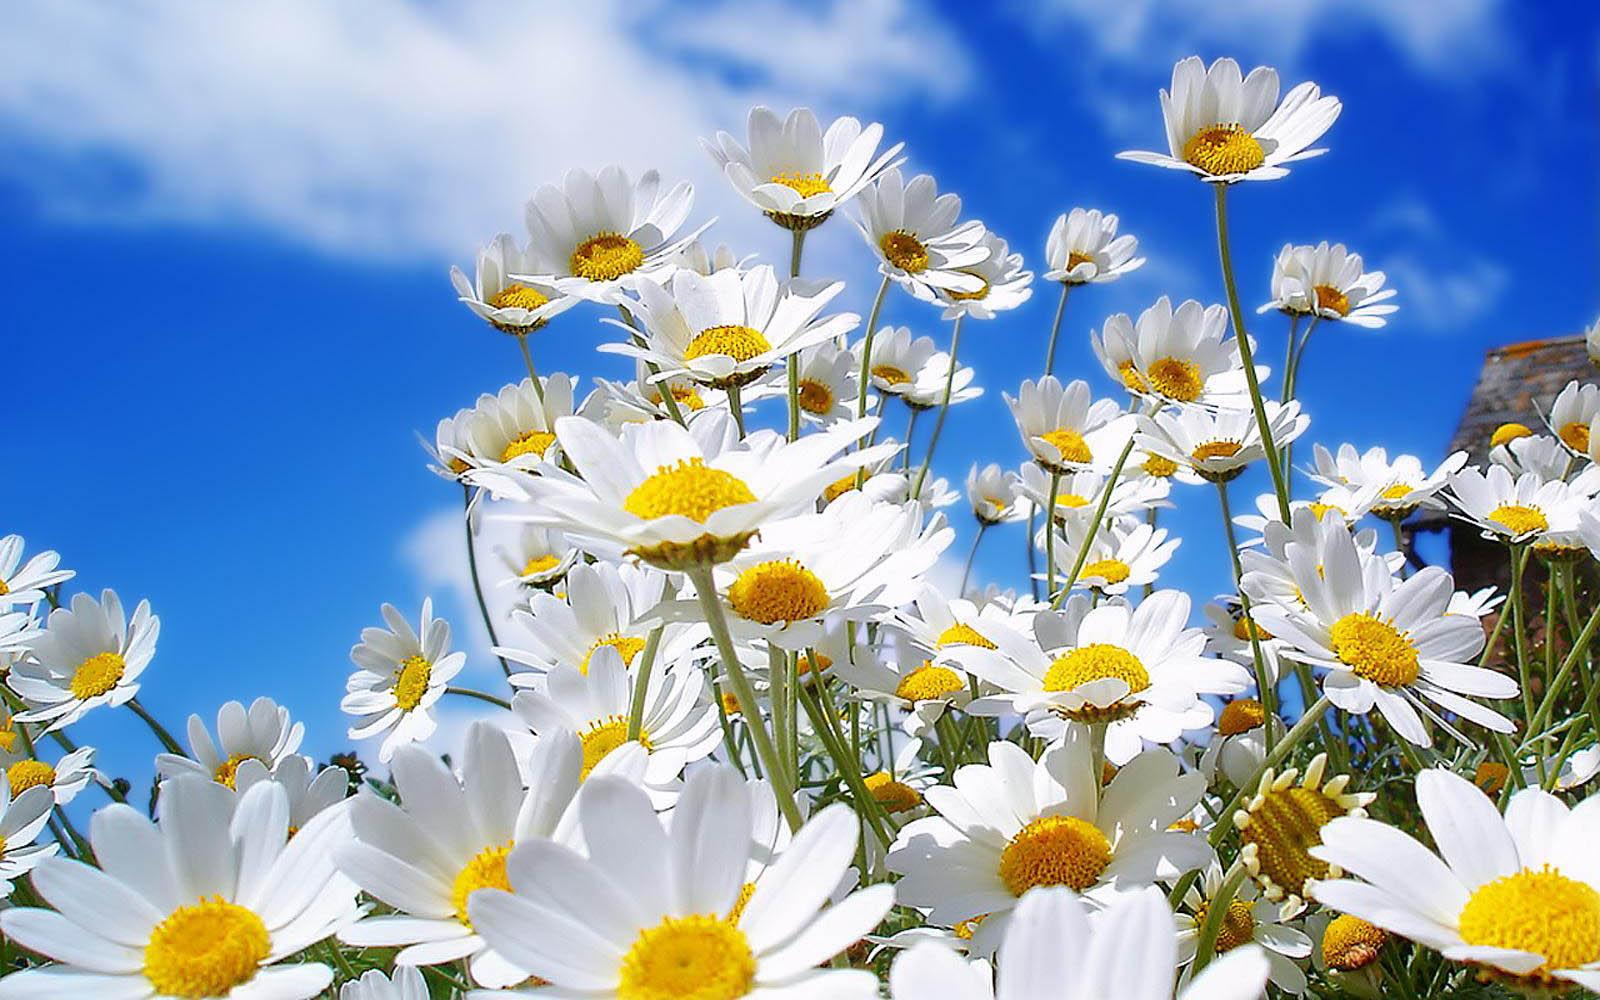 Spring Flowers For Desktop Wallpaper Best Hd Wallpapers